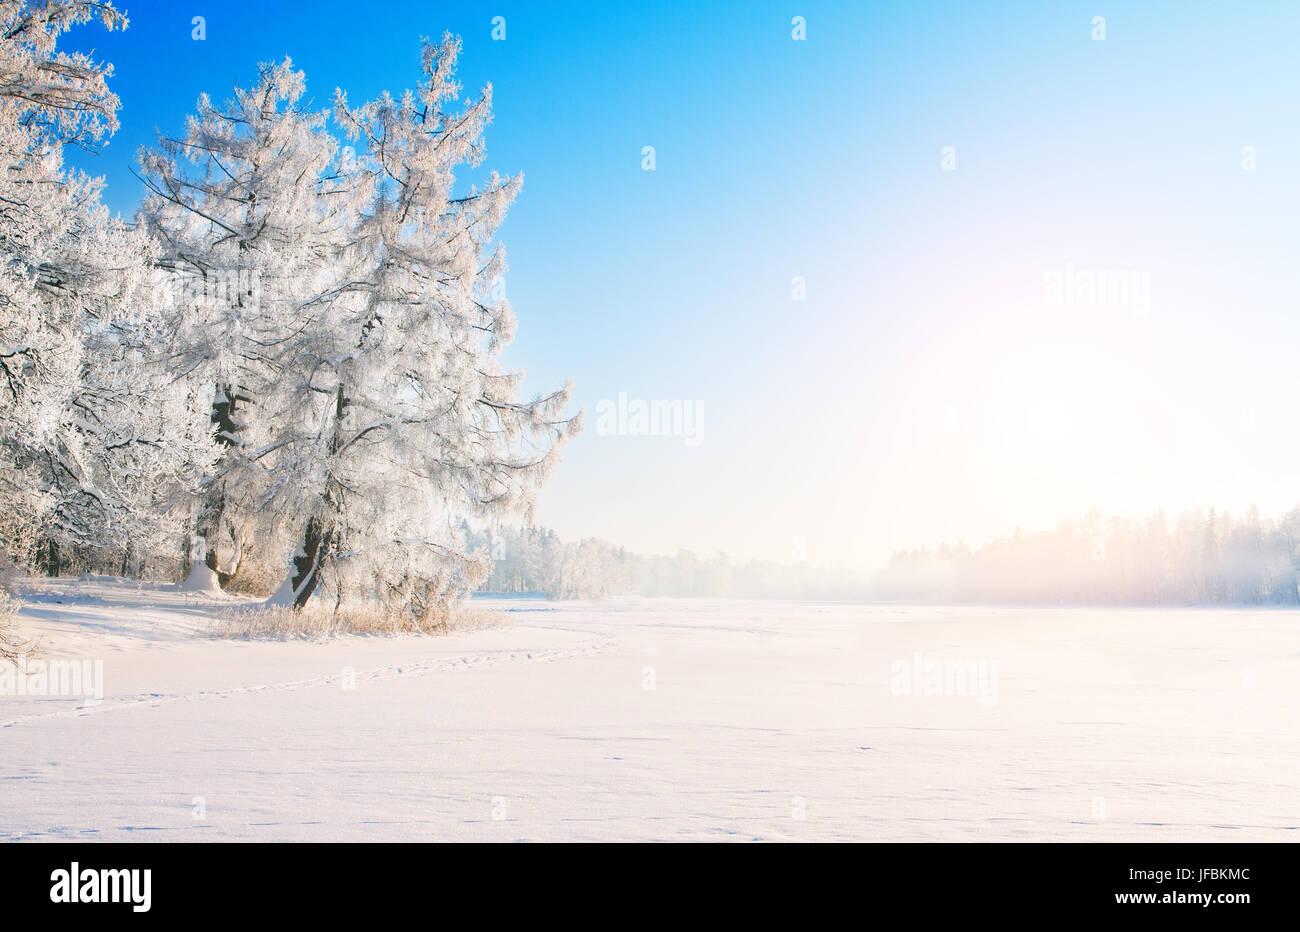 Winter park in snow Stock Photo